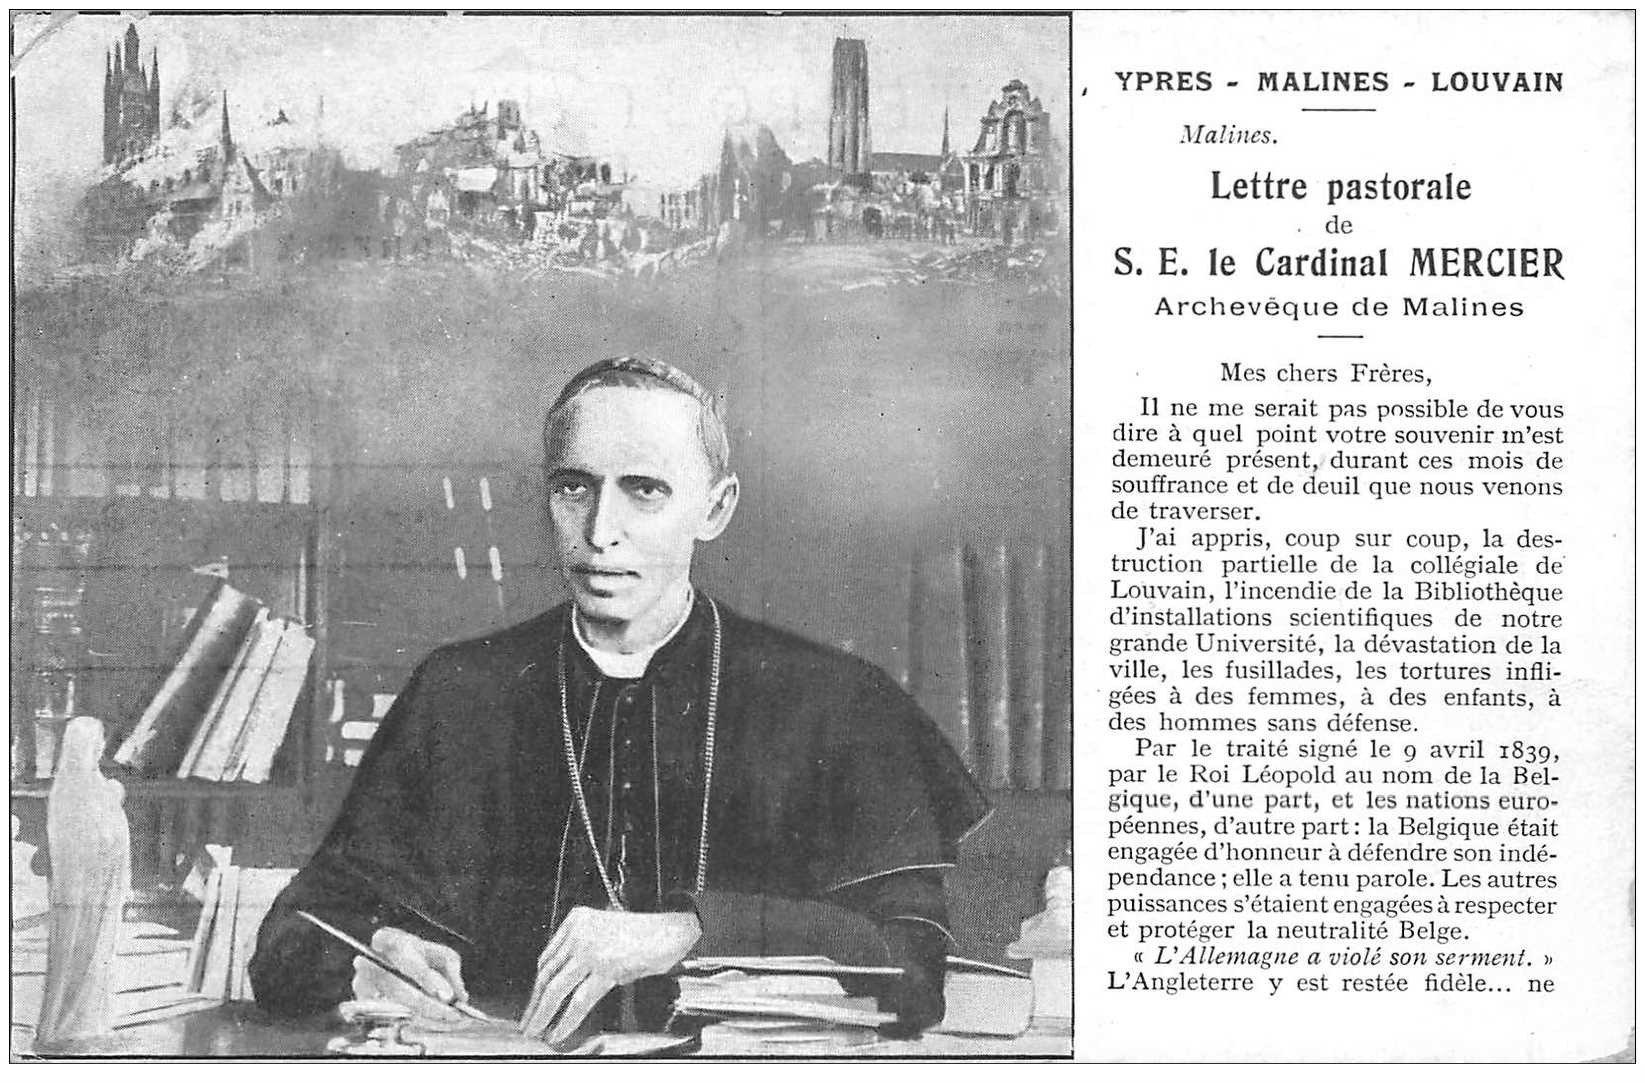 carte postale ancienne YPRES MALINES LOUVAIN. Cardinal Mercier mini pli coin